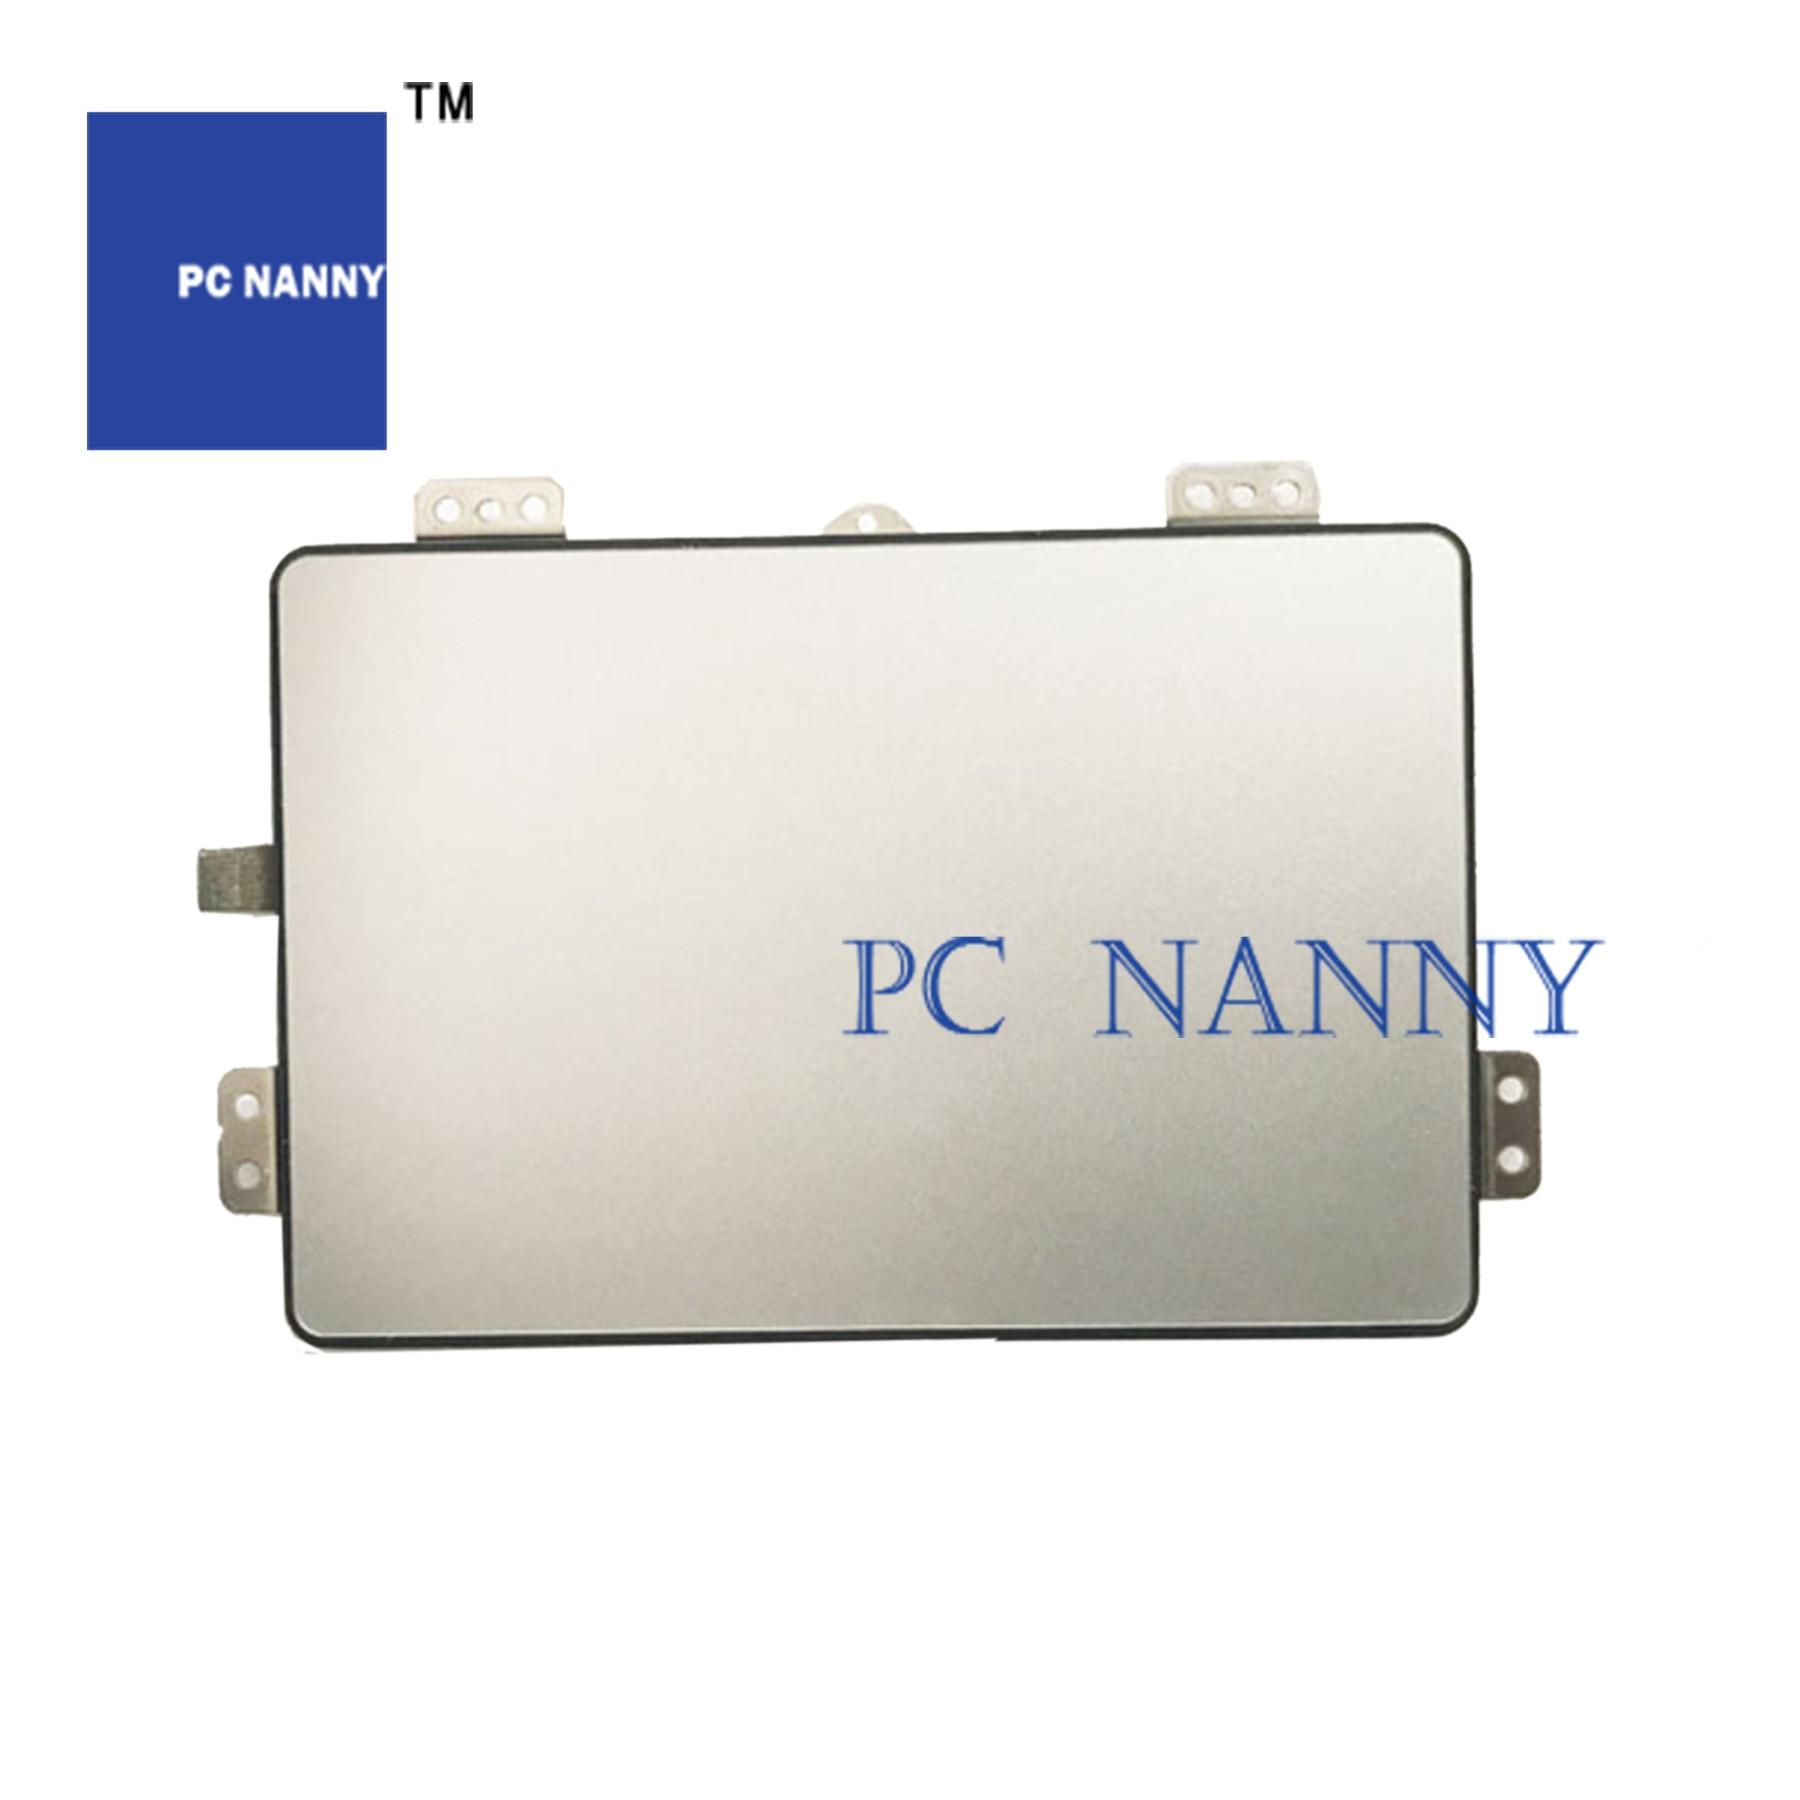 PCNANNY لينوفو YOGA530-14 FLEX6-14 Yoga530-14ISK اللمس اختبار جيدة